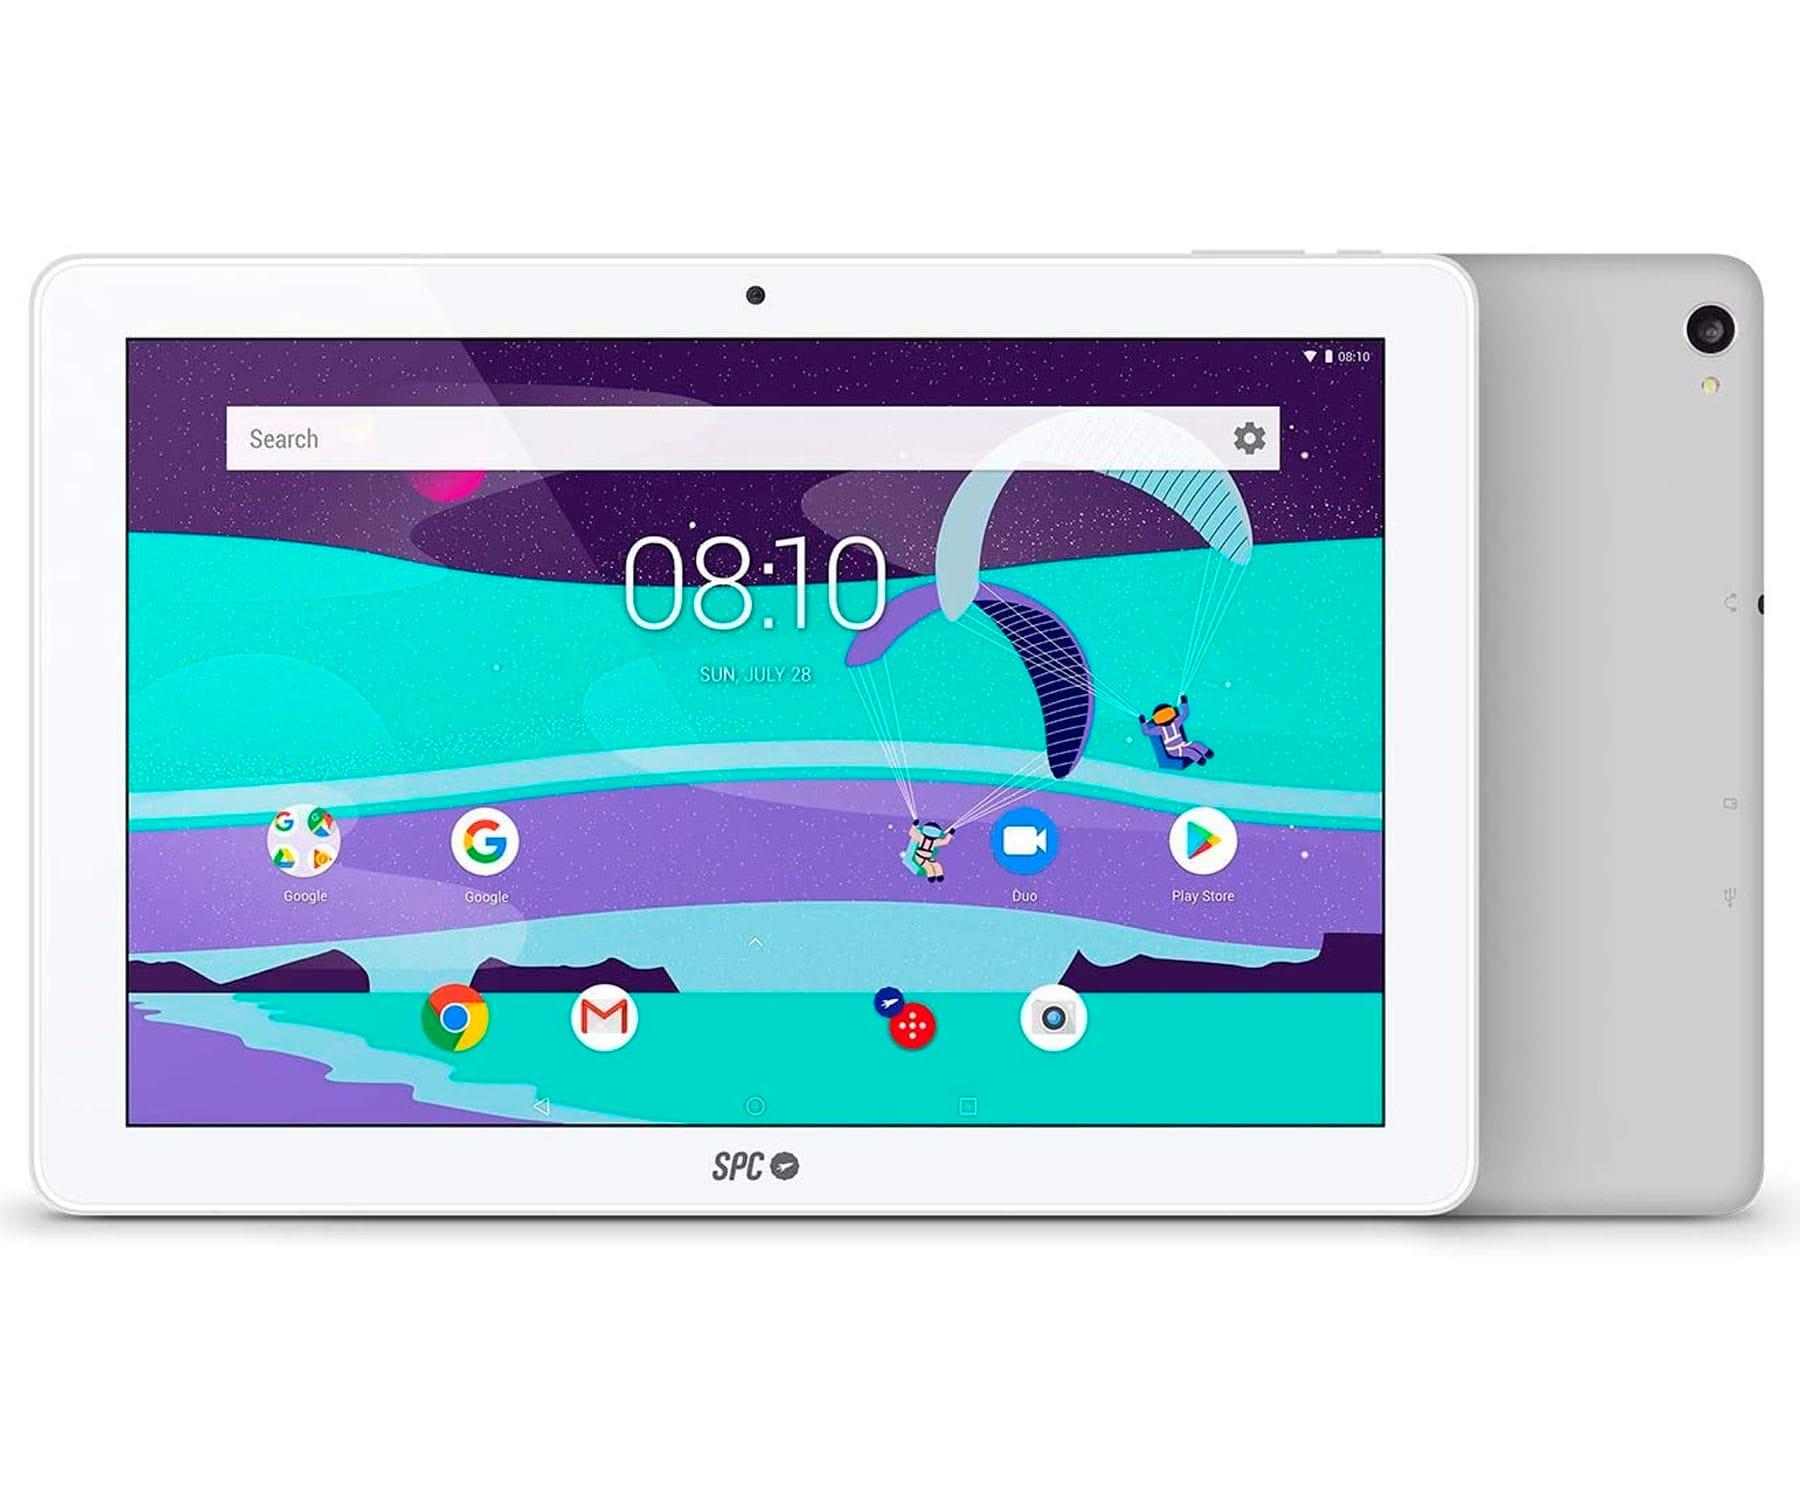 SPC GRAVITY MAX BLANCO GRIS TABLET WIFI 10.1'' IPS HD QUADCORE 32GB 2GB RAM CAM 5MP SELFIES 2MP